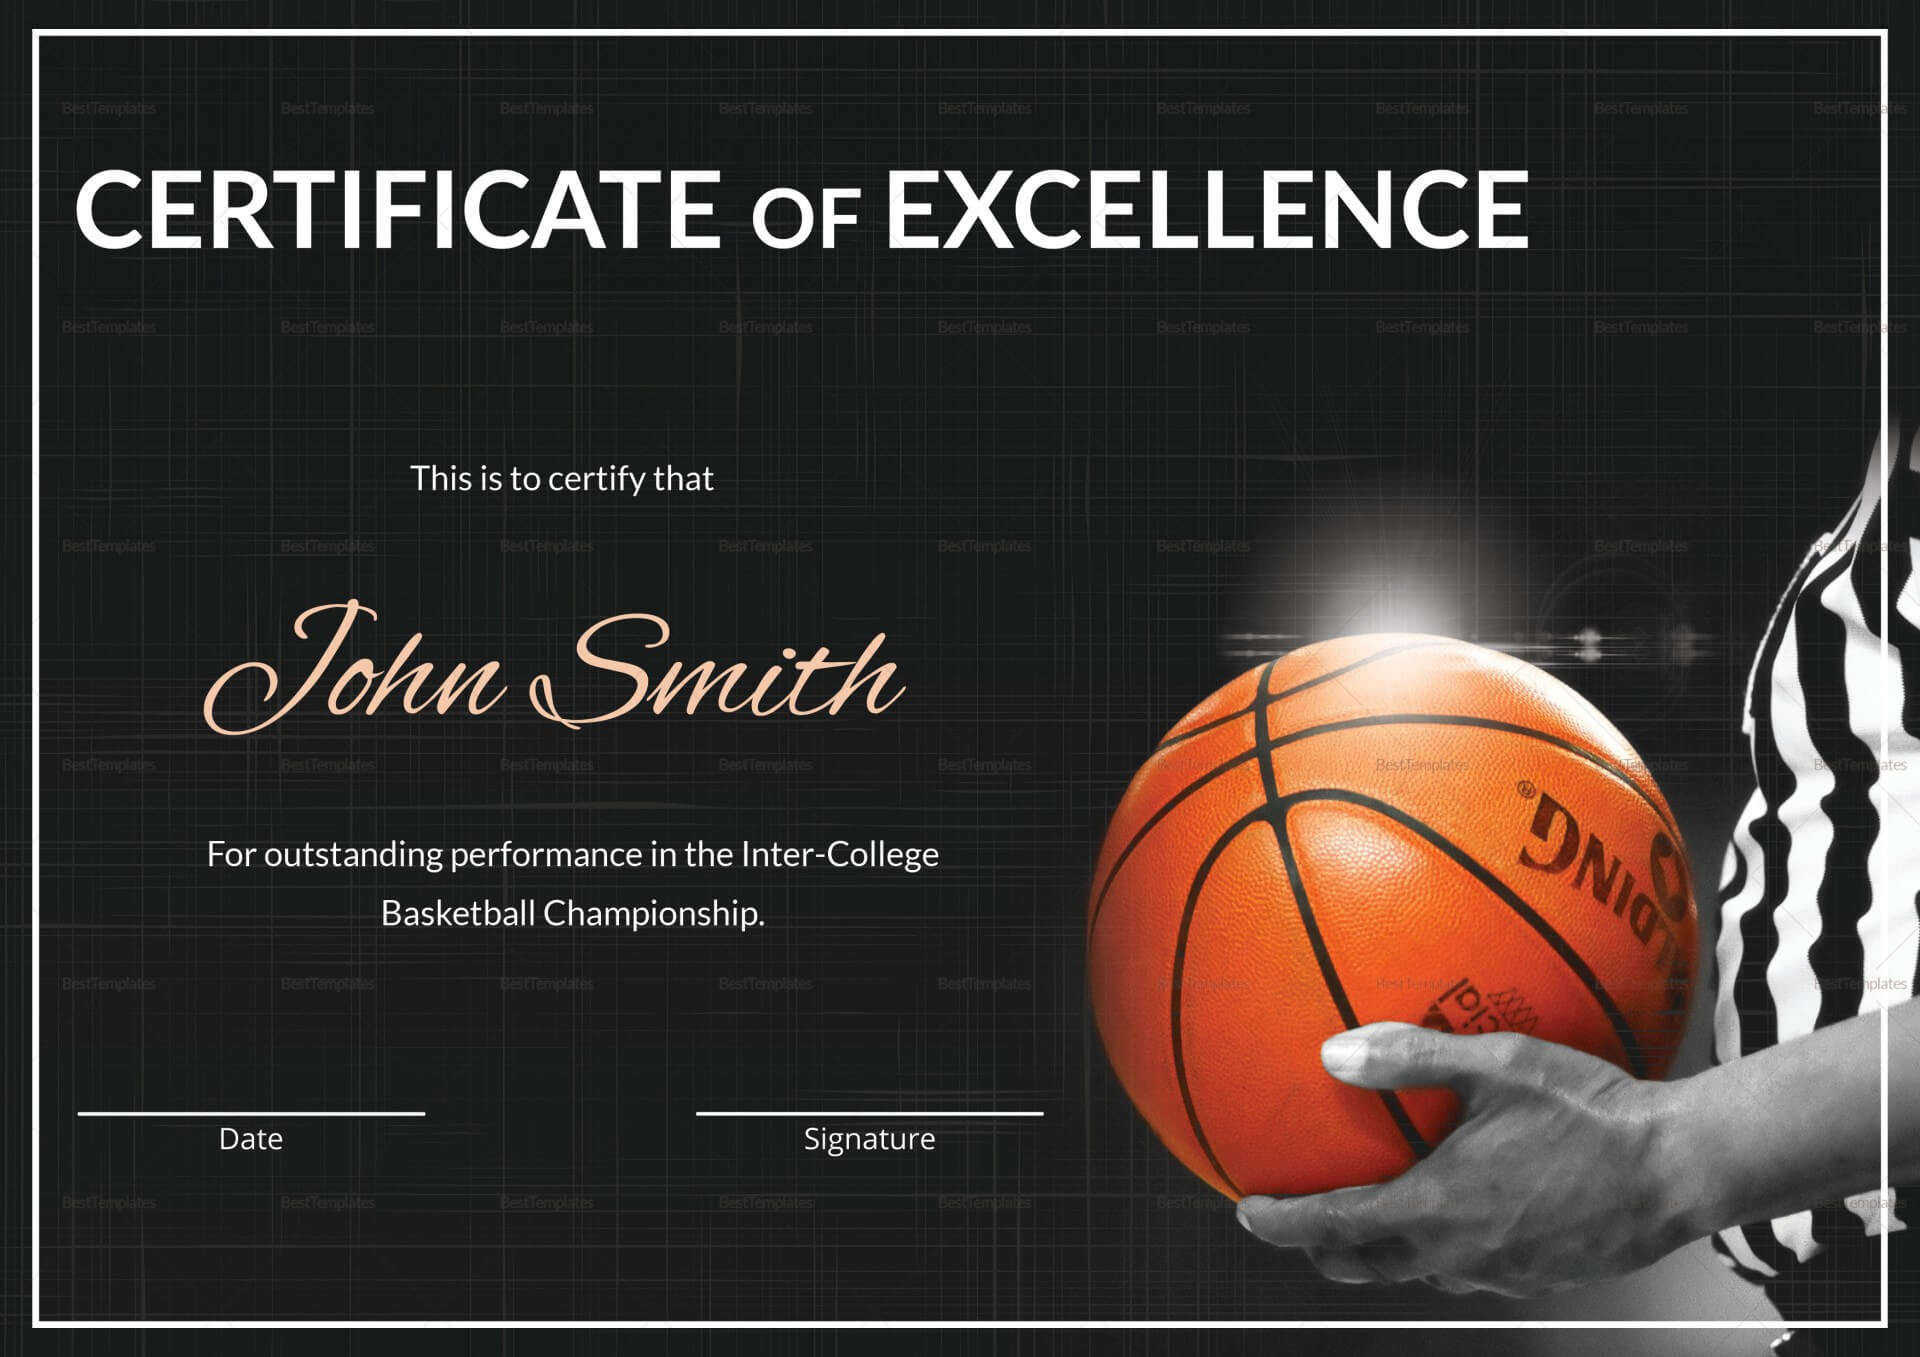 021 Basketball Certificate Award Template Word Awful Ideas With Regard To Basketball Certificate Template